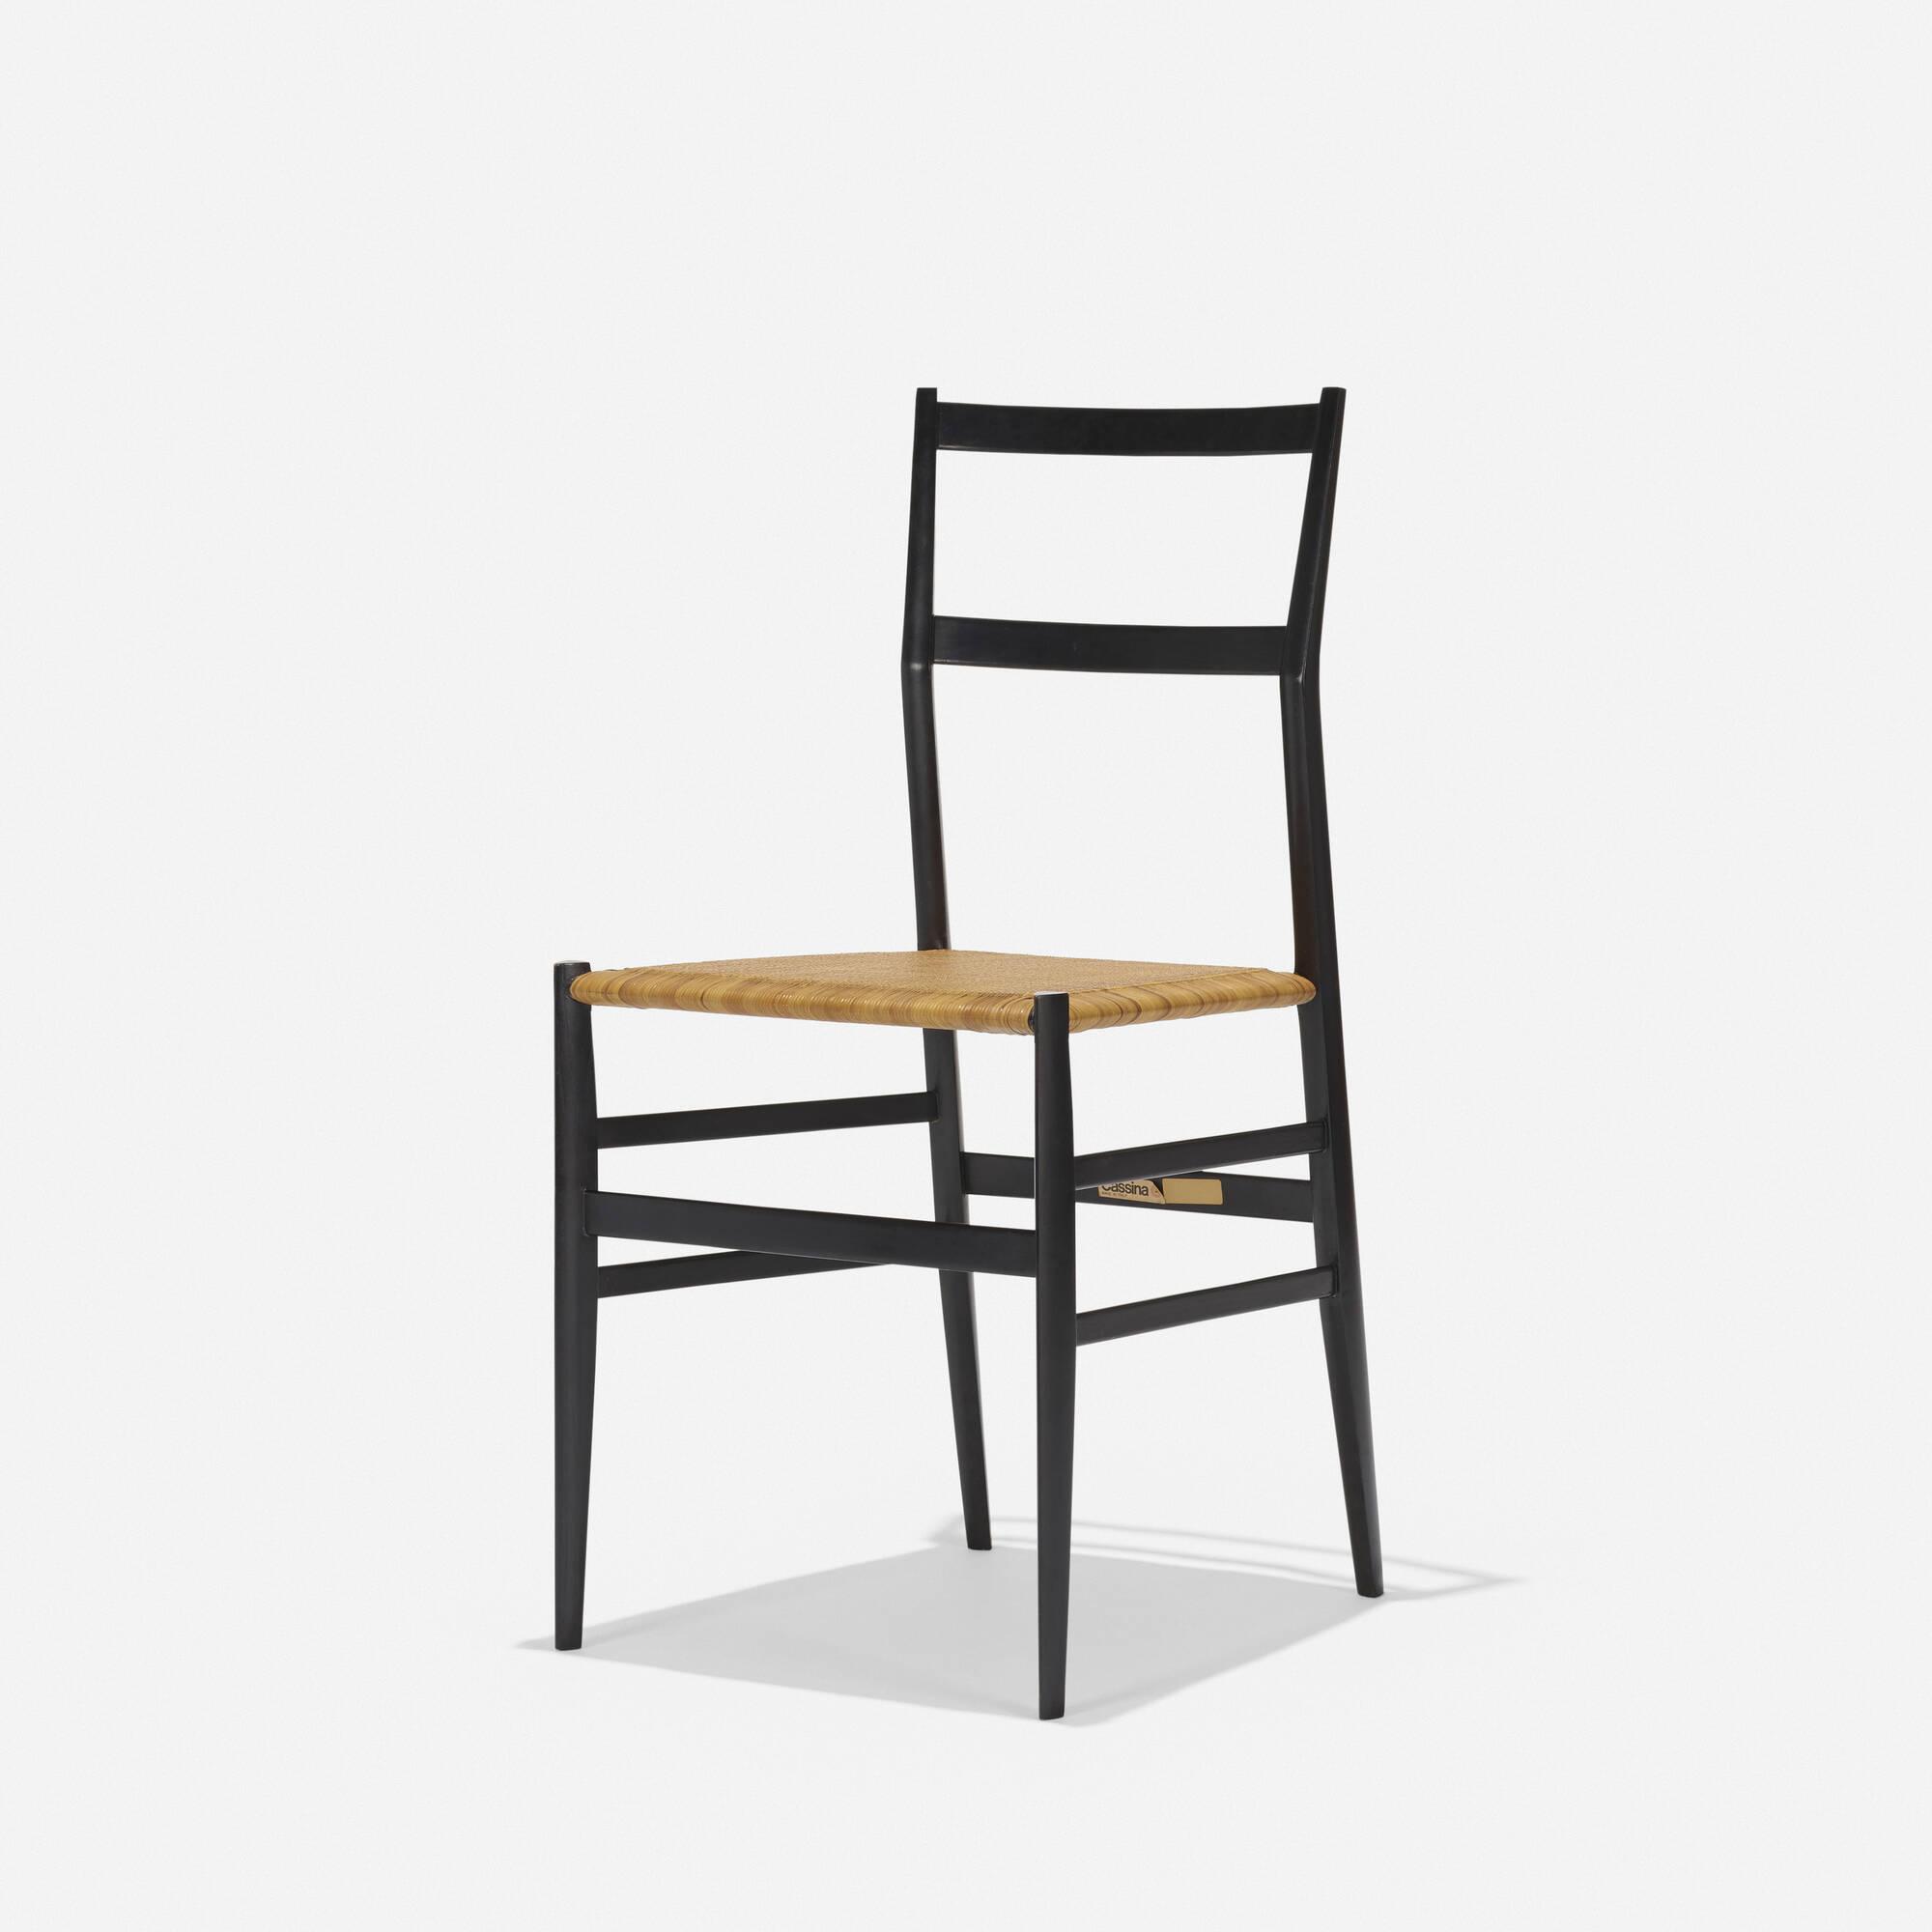 427 GIO PONTI Superleggera chair